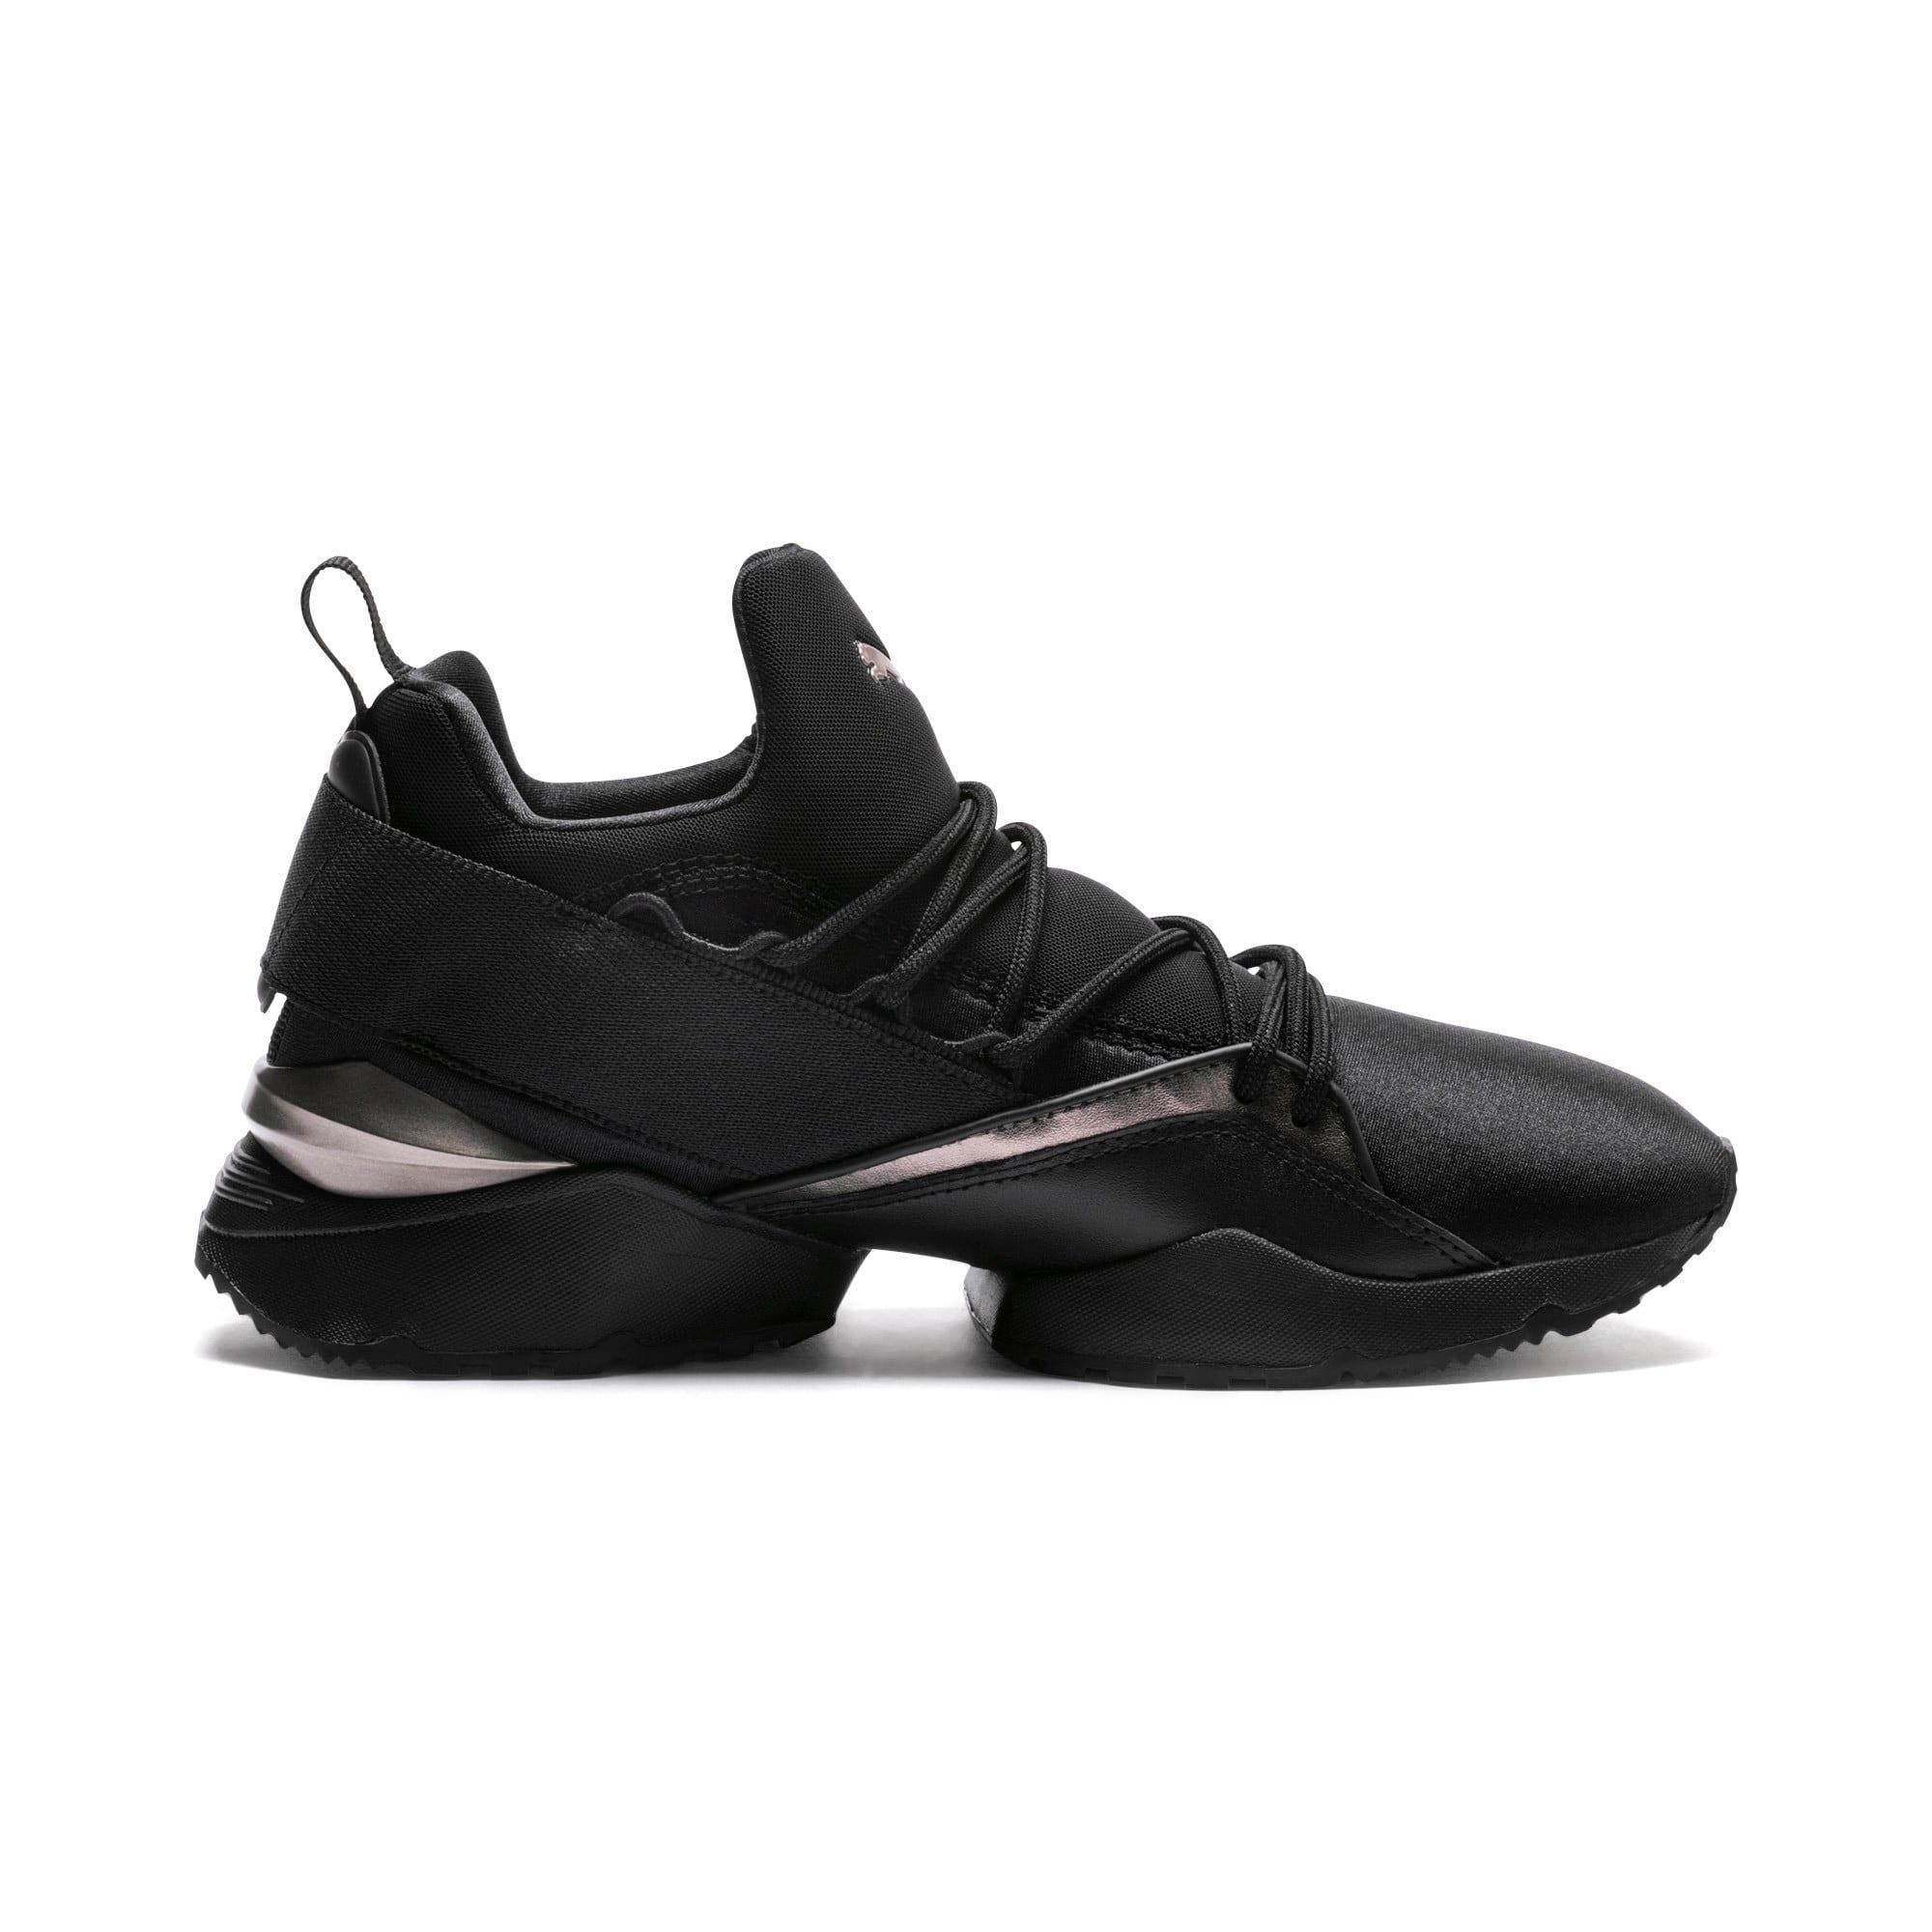 Thumbnail 5 of Muse Maia Luxe Women's Sneakers, Puma Black-Puma Black, medium